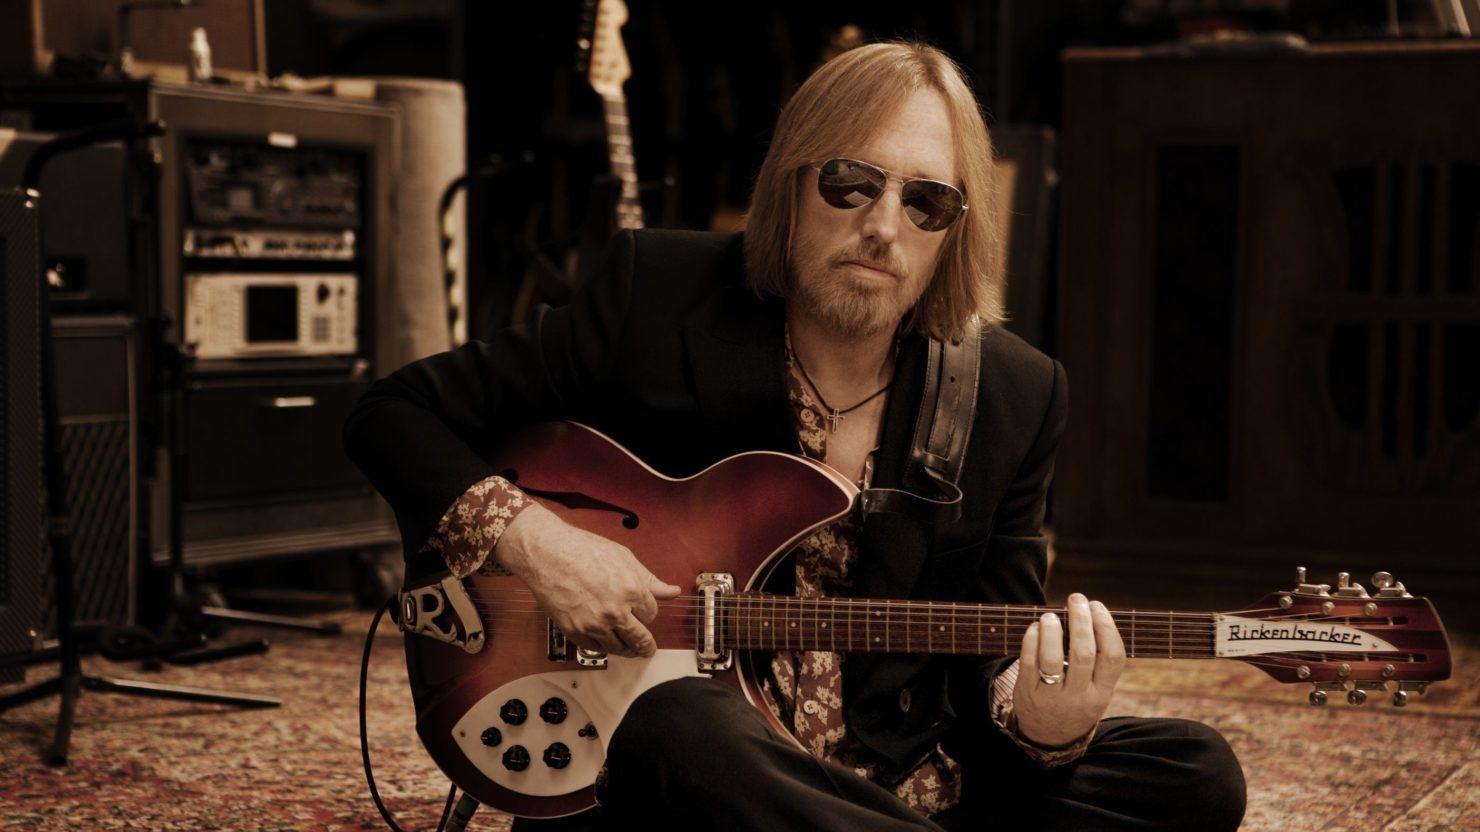 Siriusxm Announces Tom Petty Radio Channel